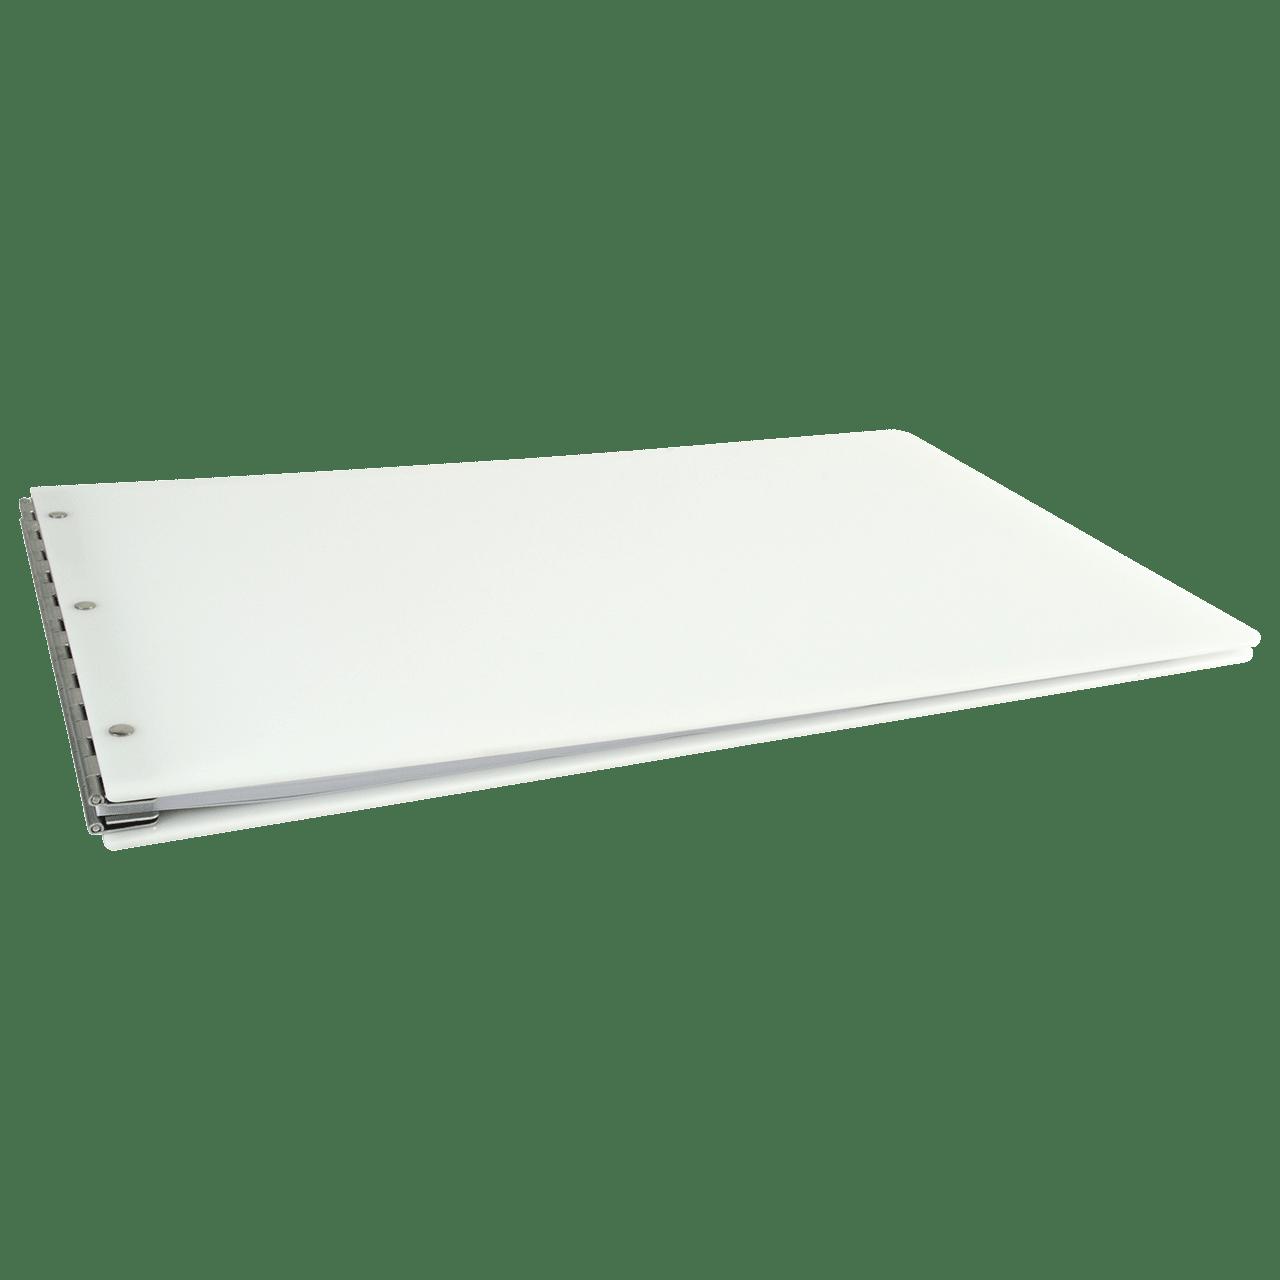 11x17 Binder Screw Post Acrylic Aluminum Hinge Black